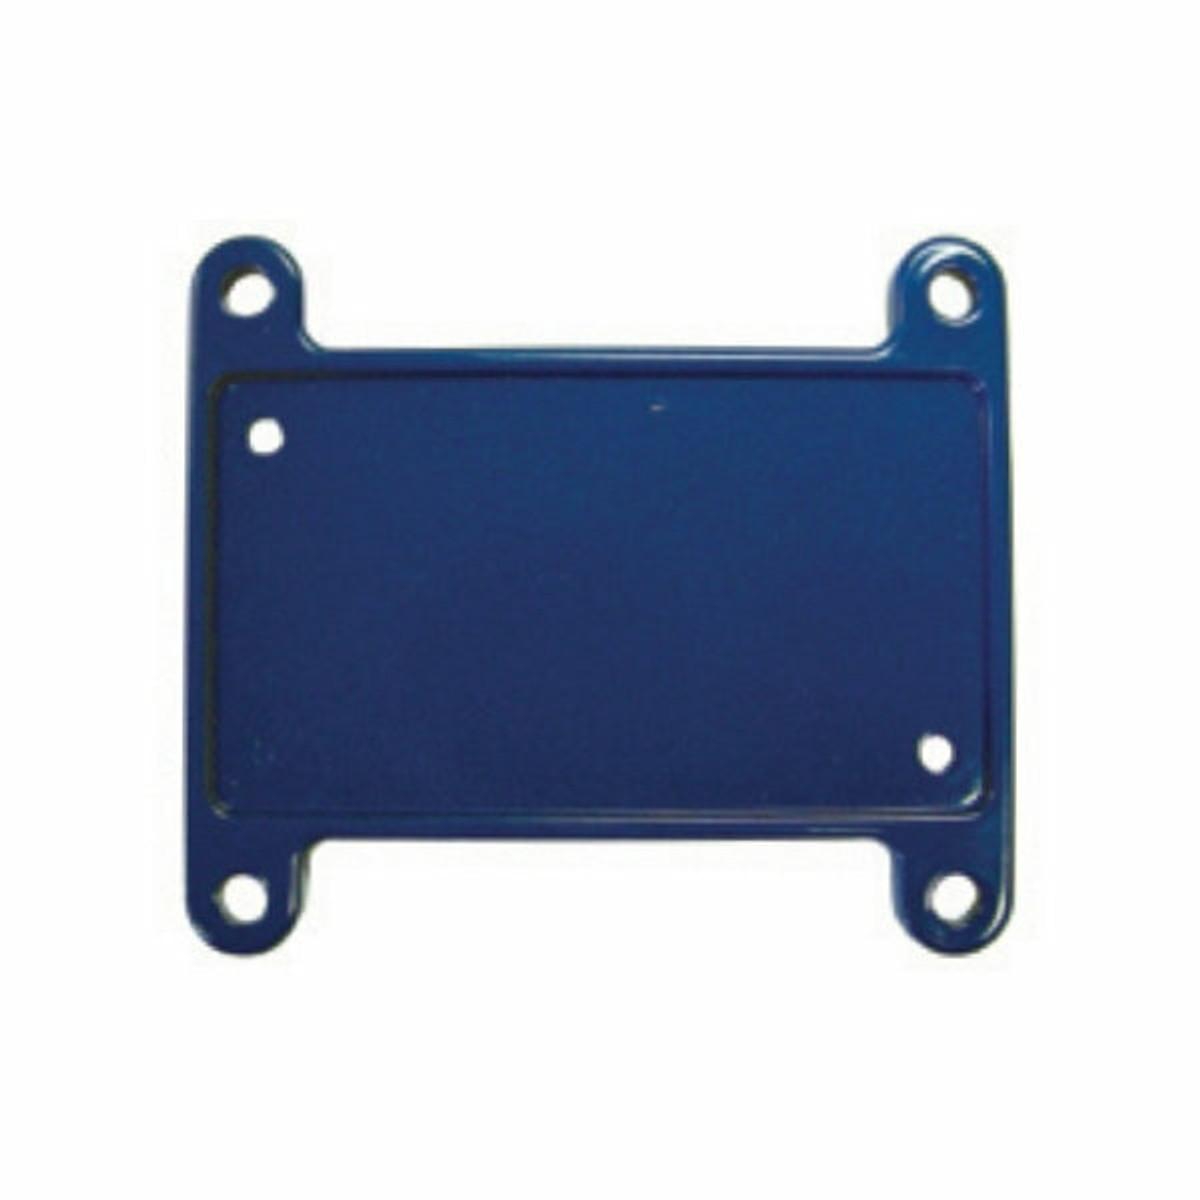 weBoost (Wilson) Mounting Plate for DataPro Amplifier - 901138